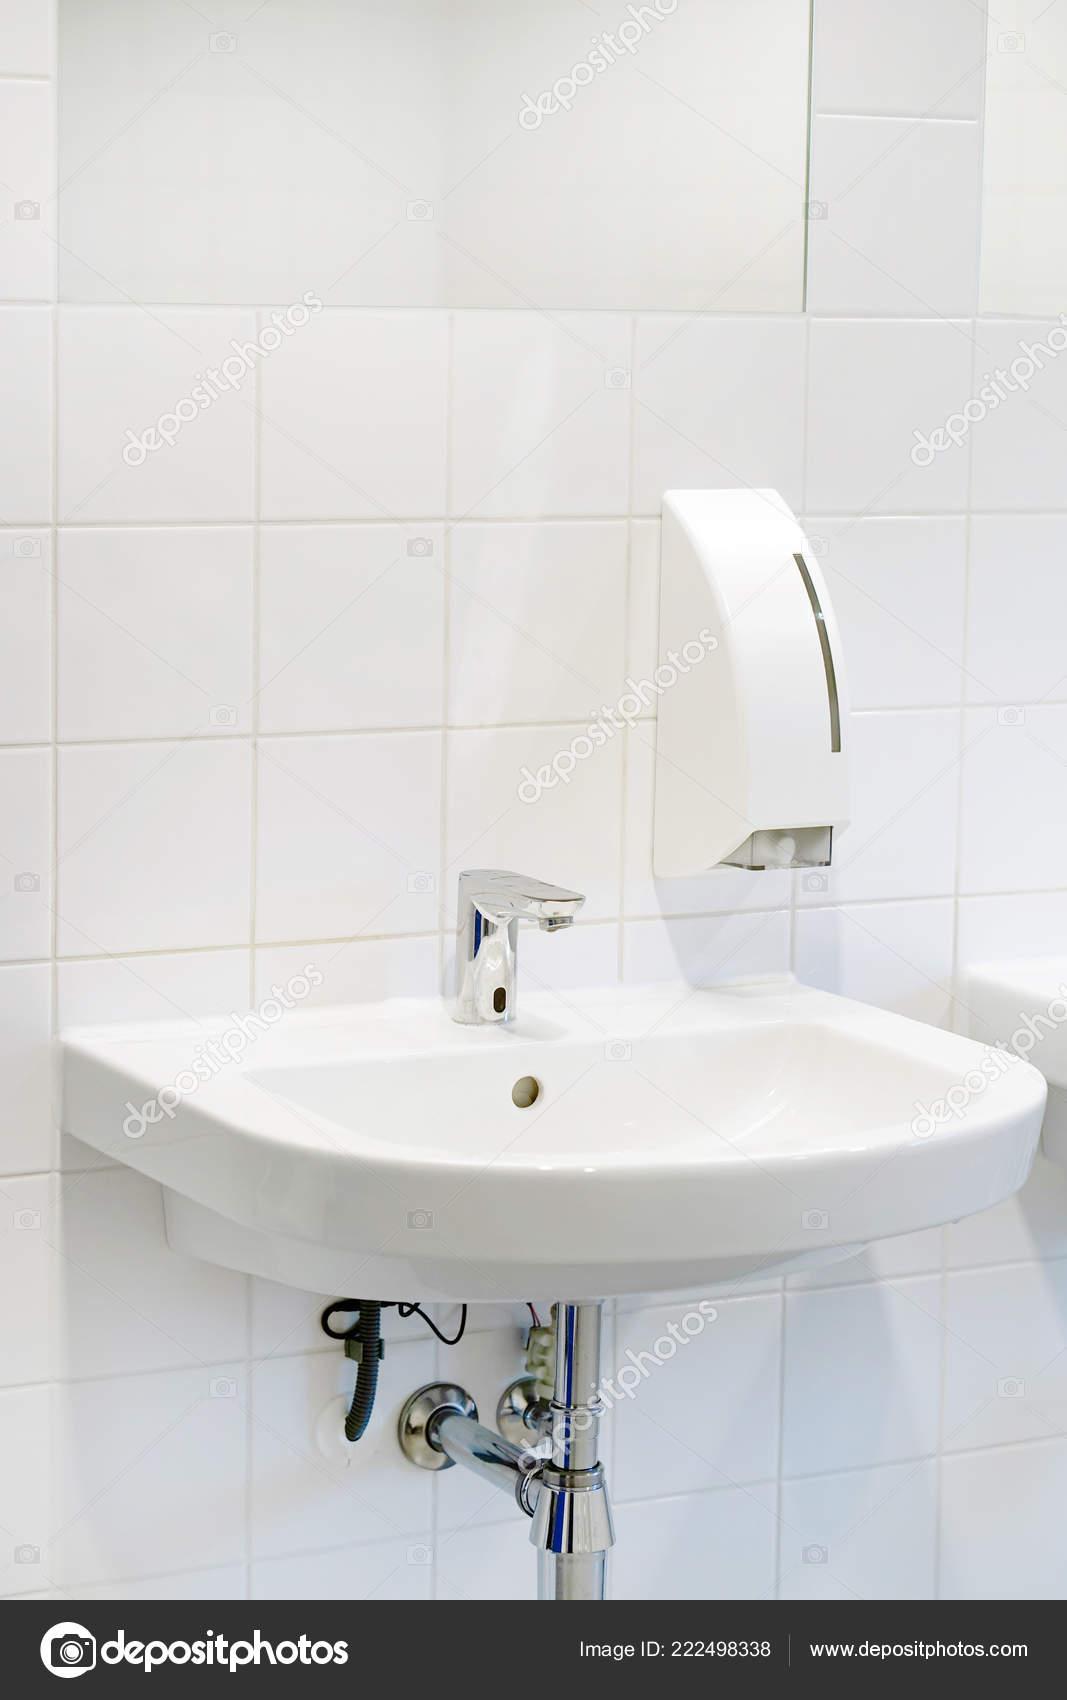 . Bathroom Interior Sink Modern Design Interior Bathroom Washbasin